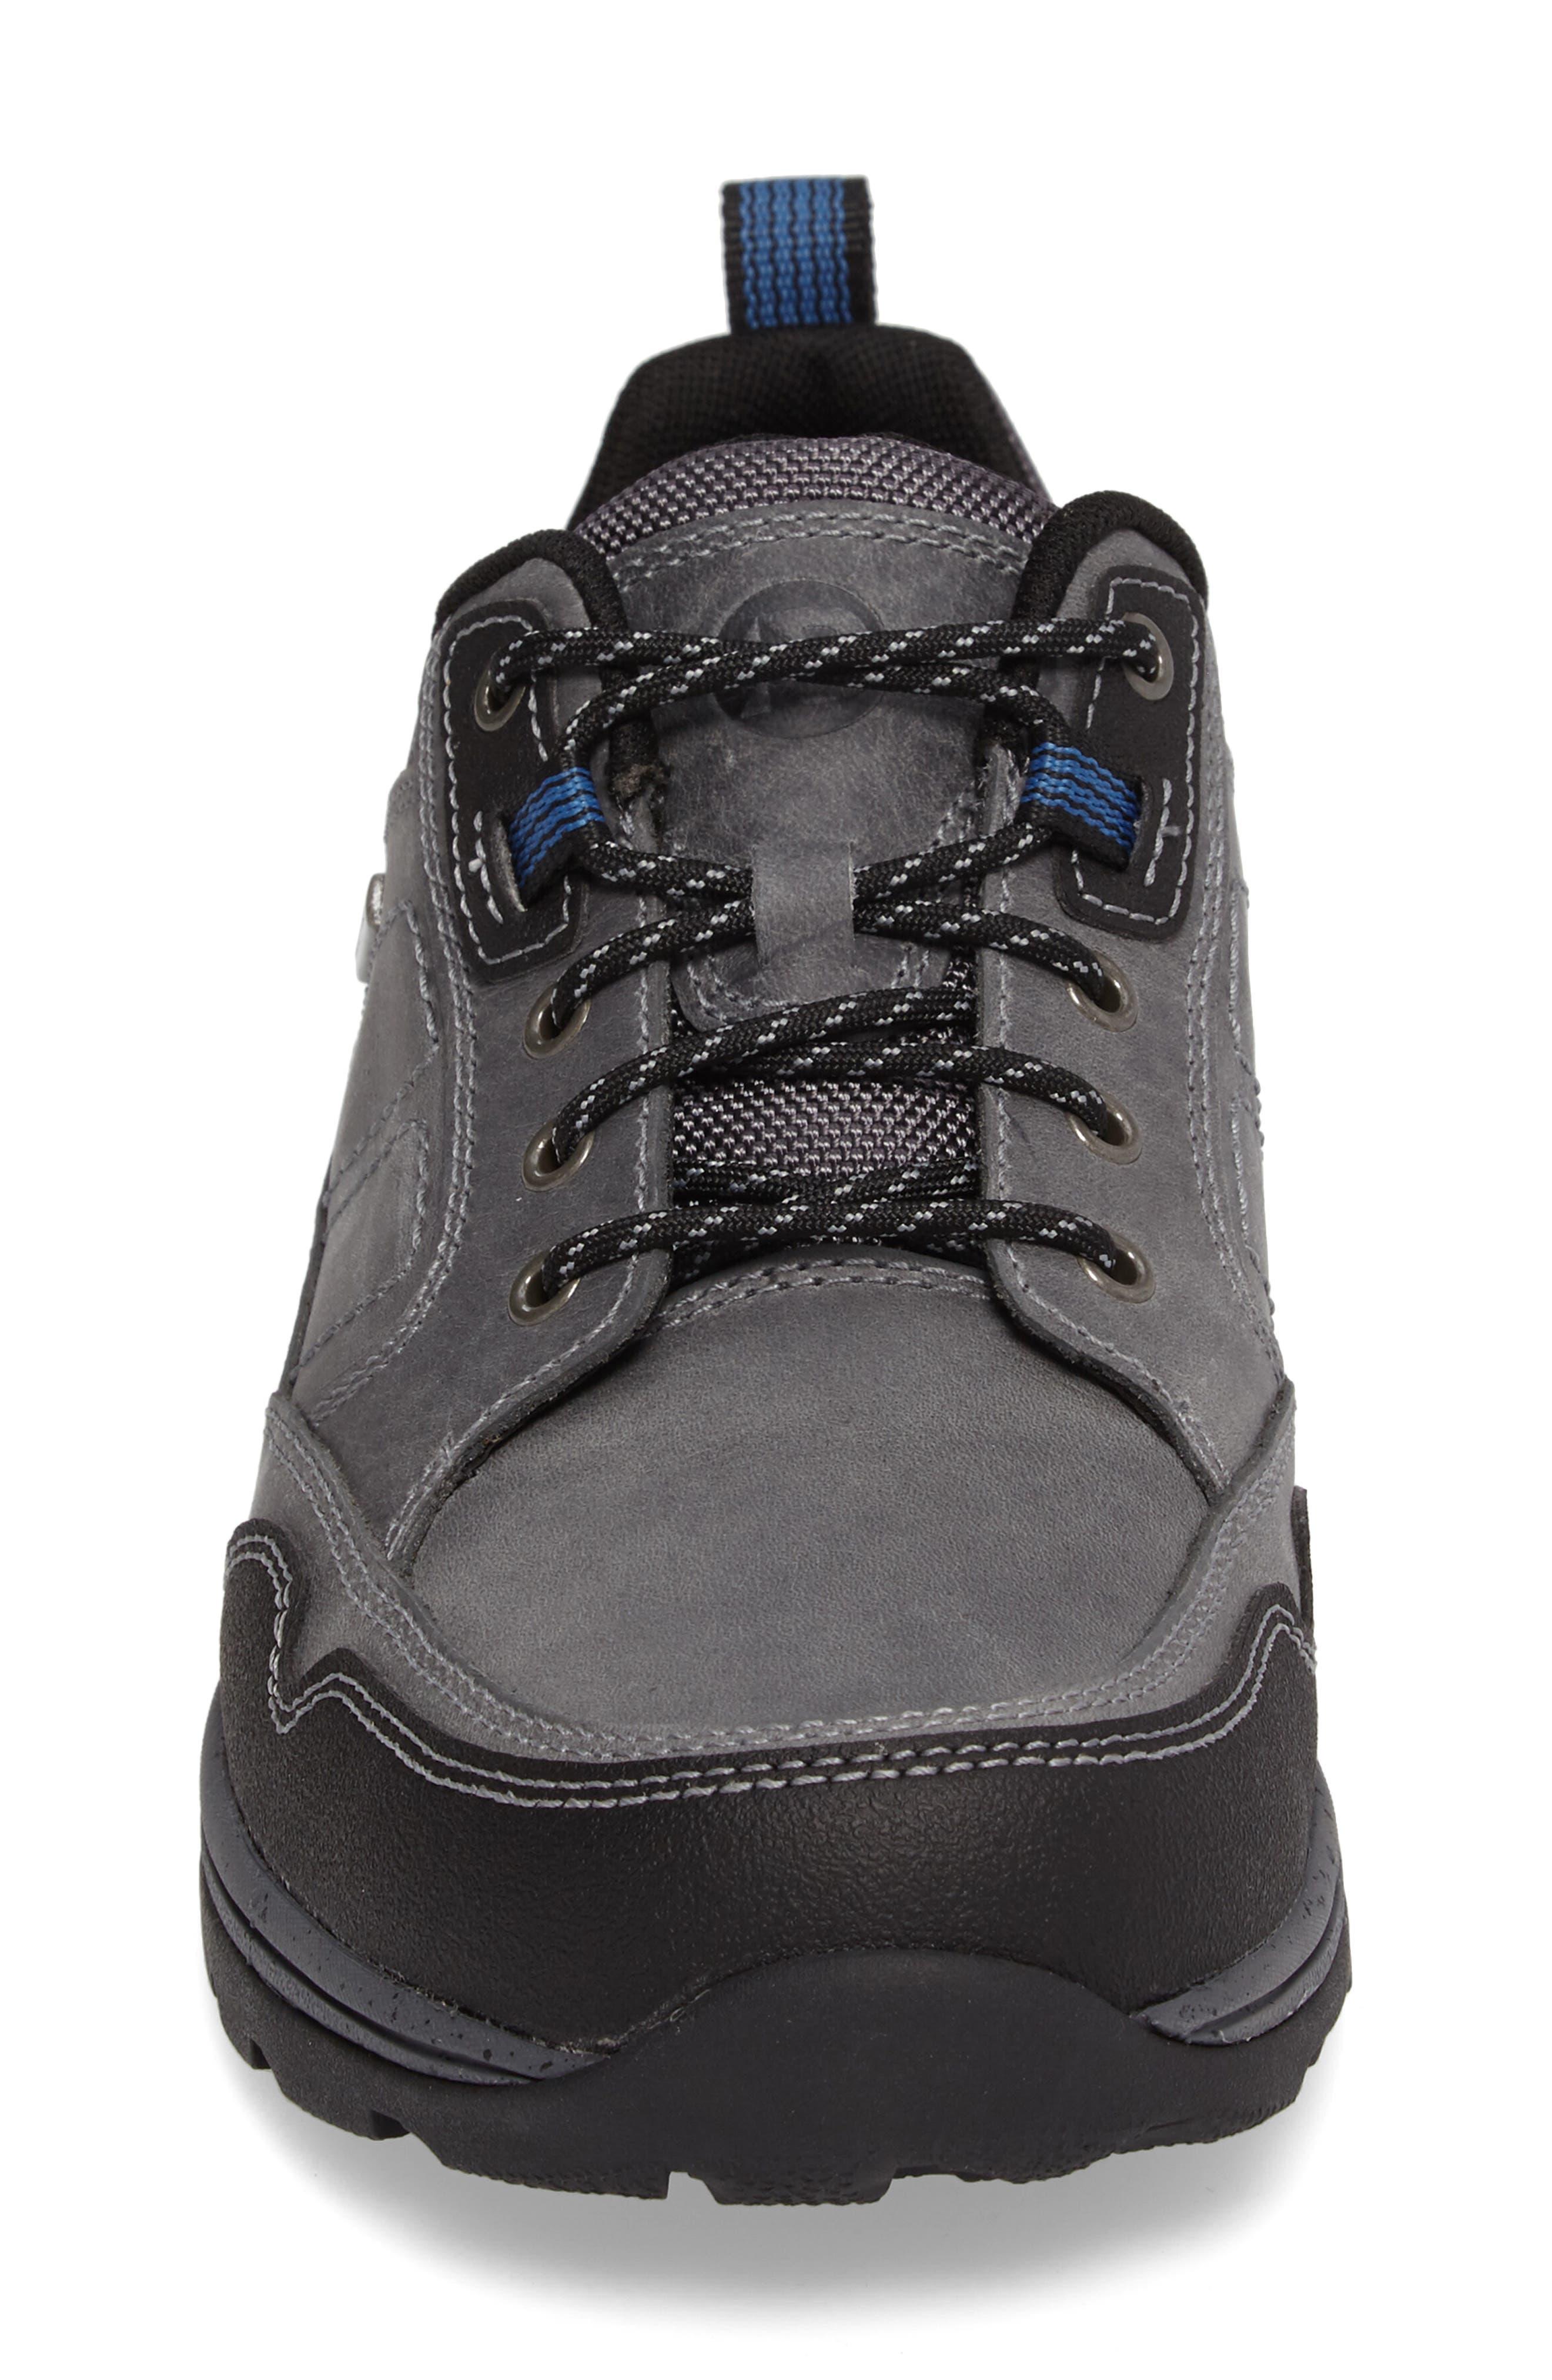 Trukka Hiking Shoe,                             Alternate thumbnail 4, color,                             GREY